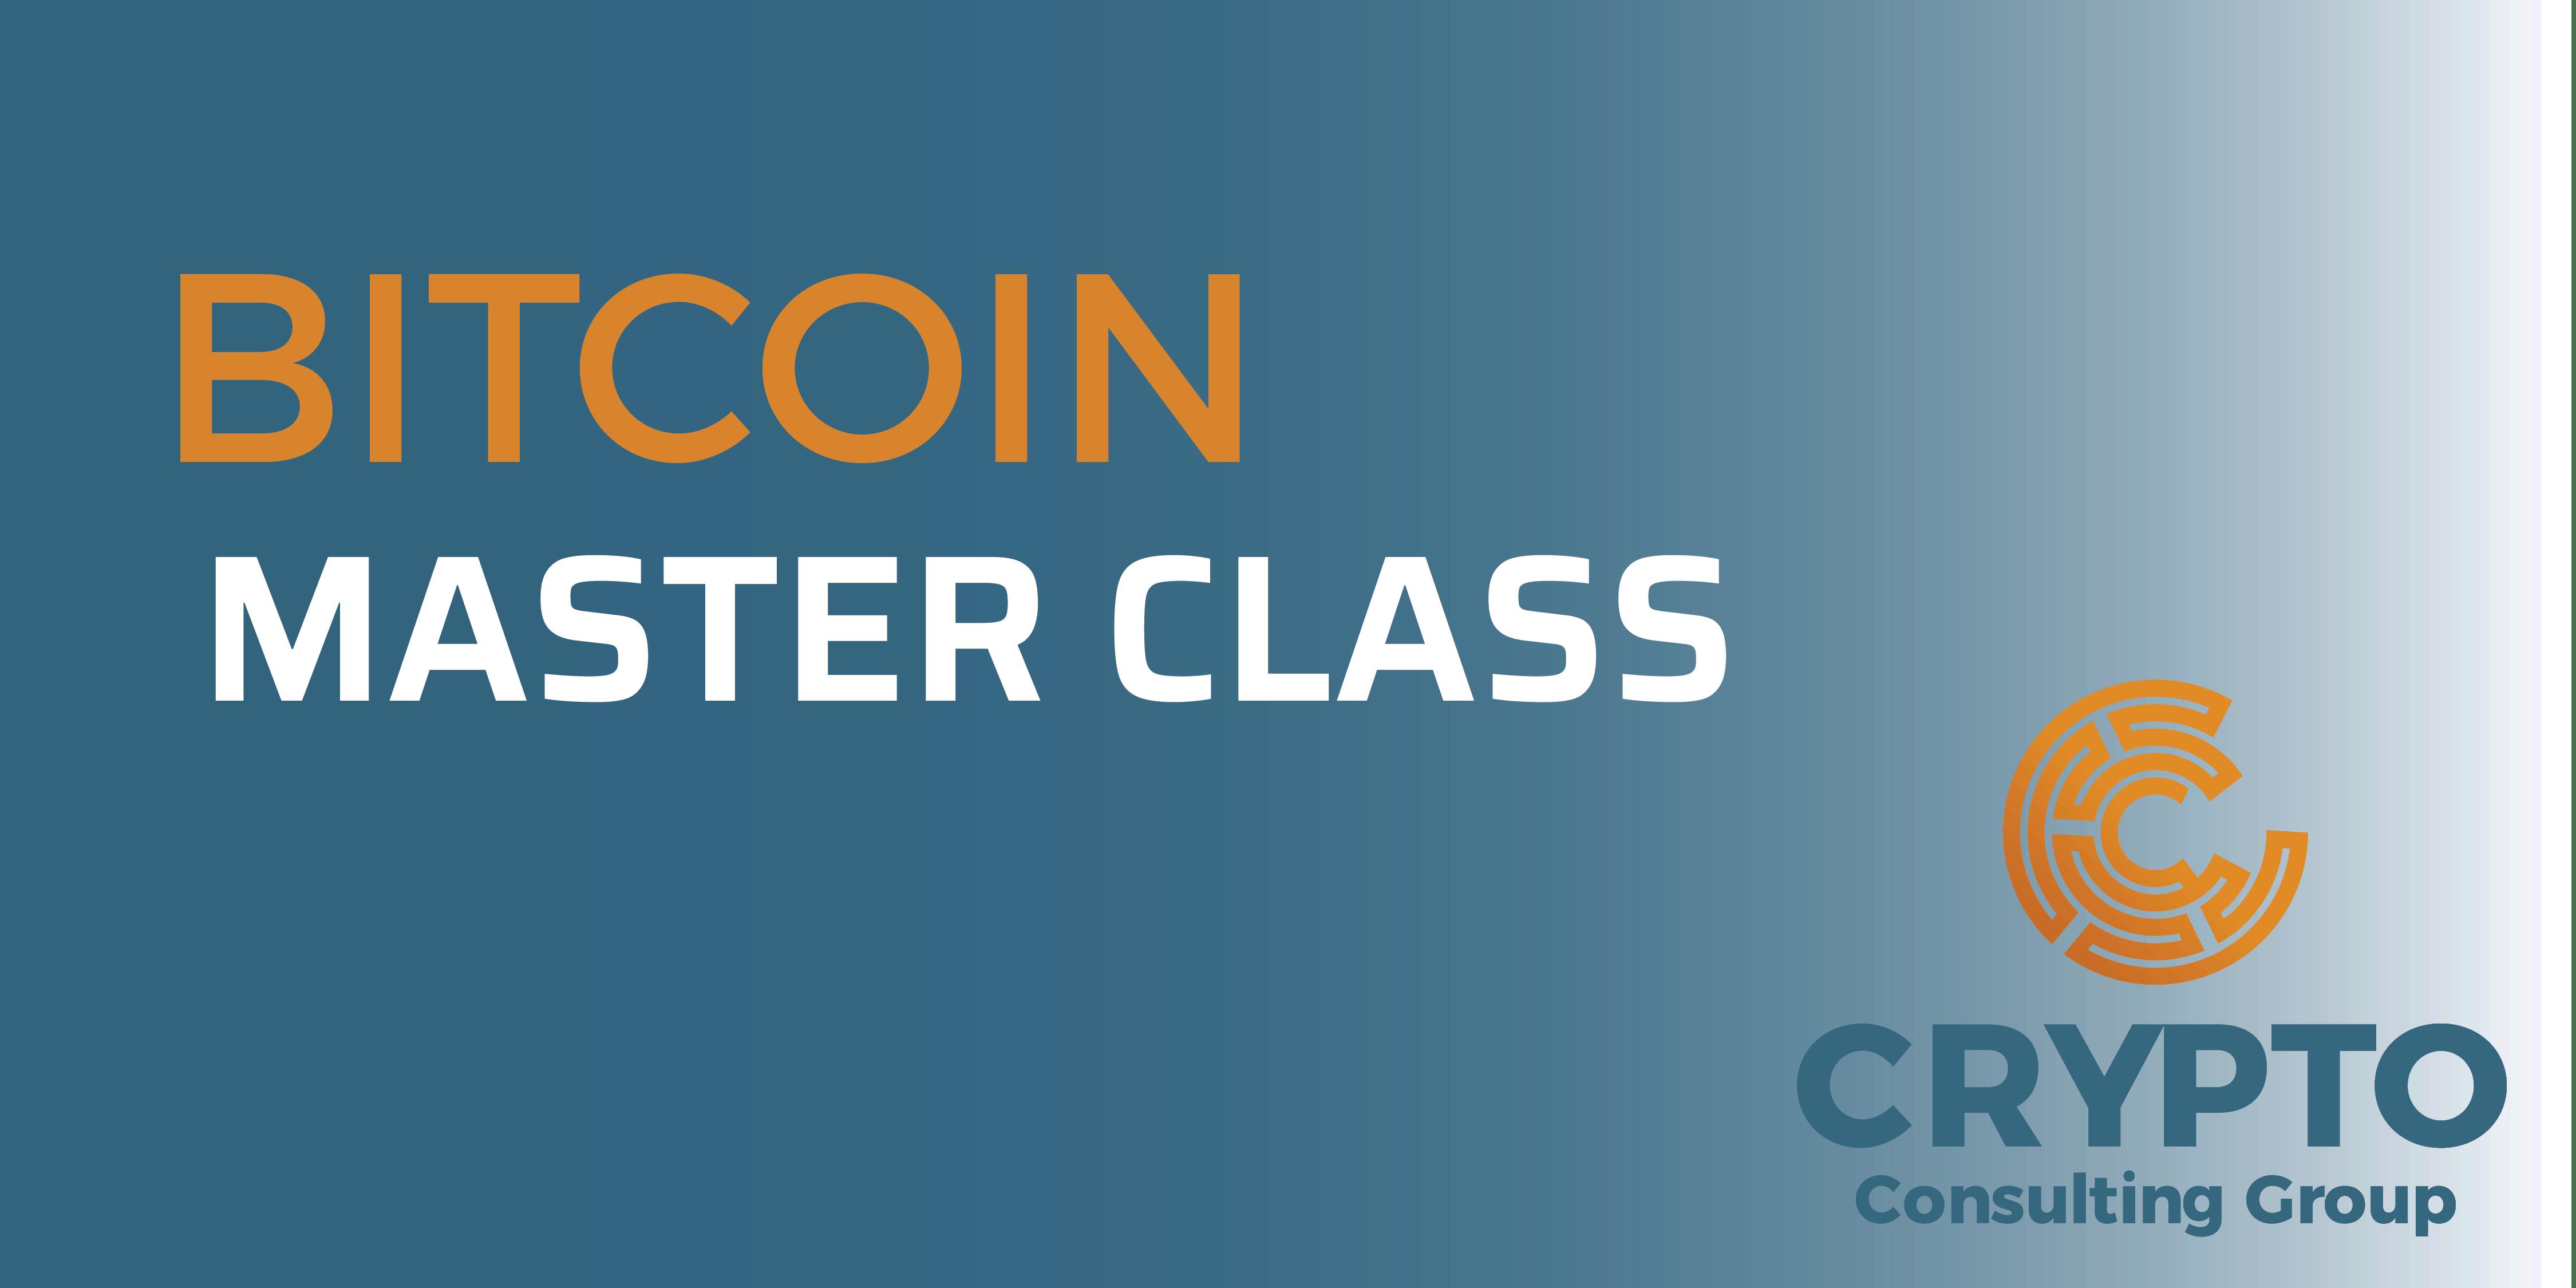 Bitcoin Master Class